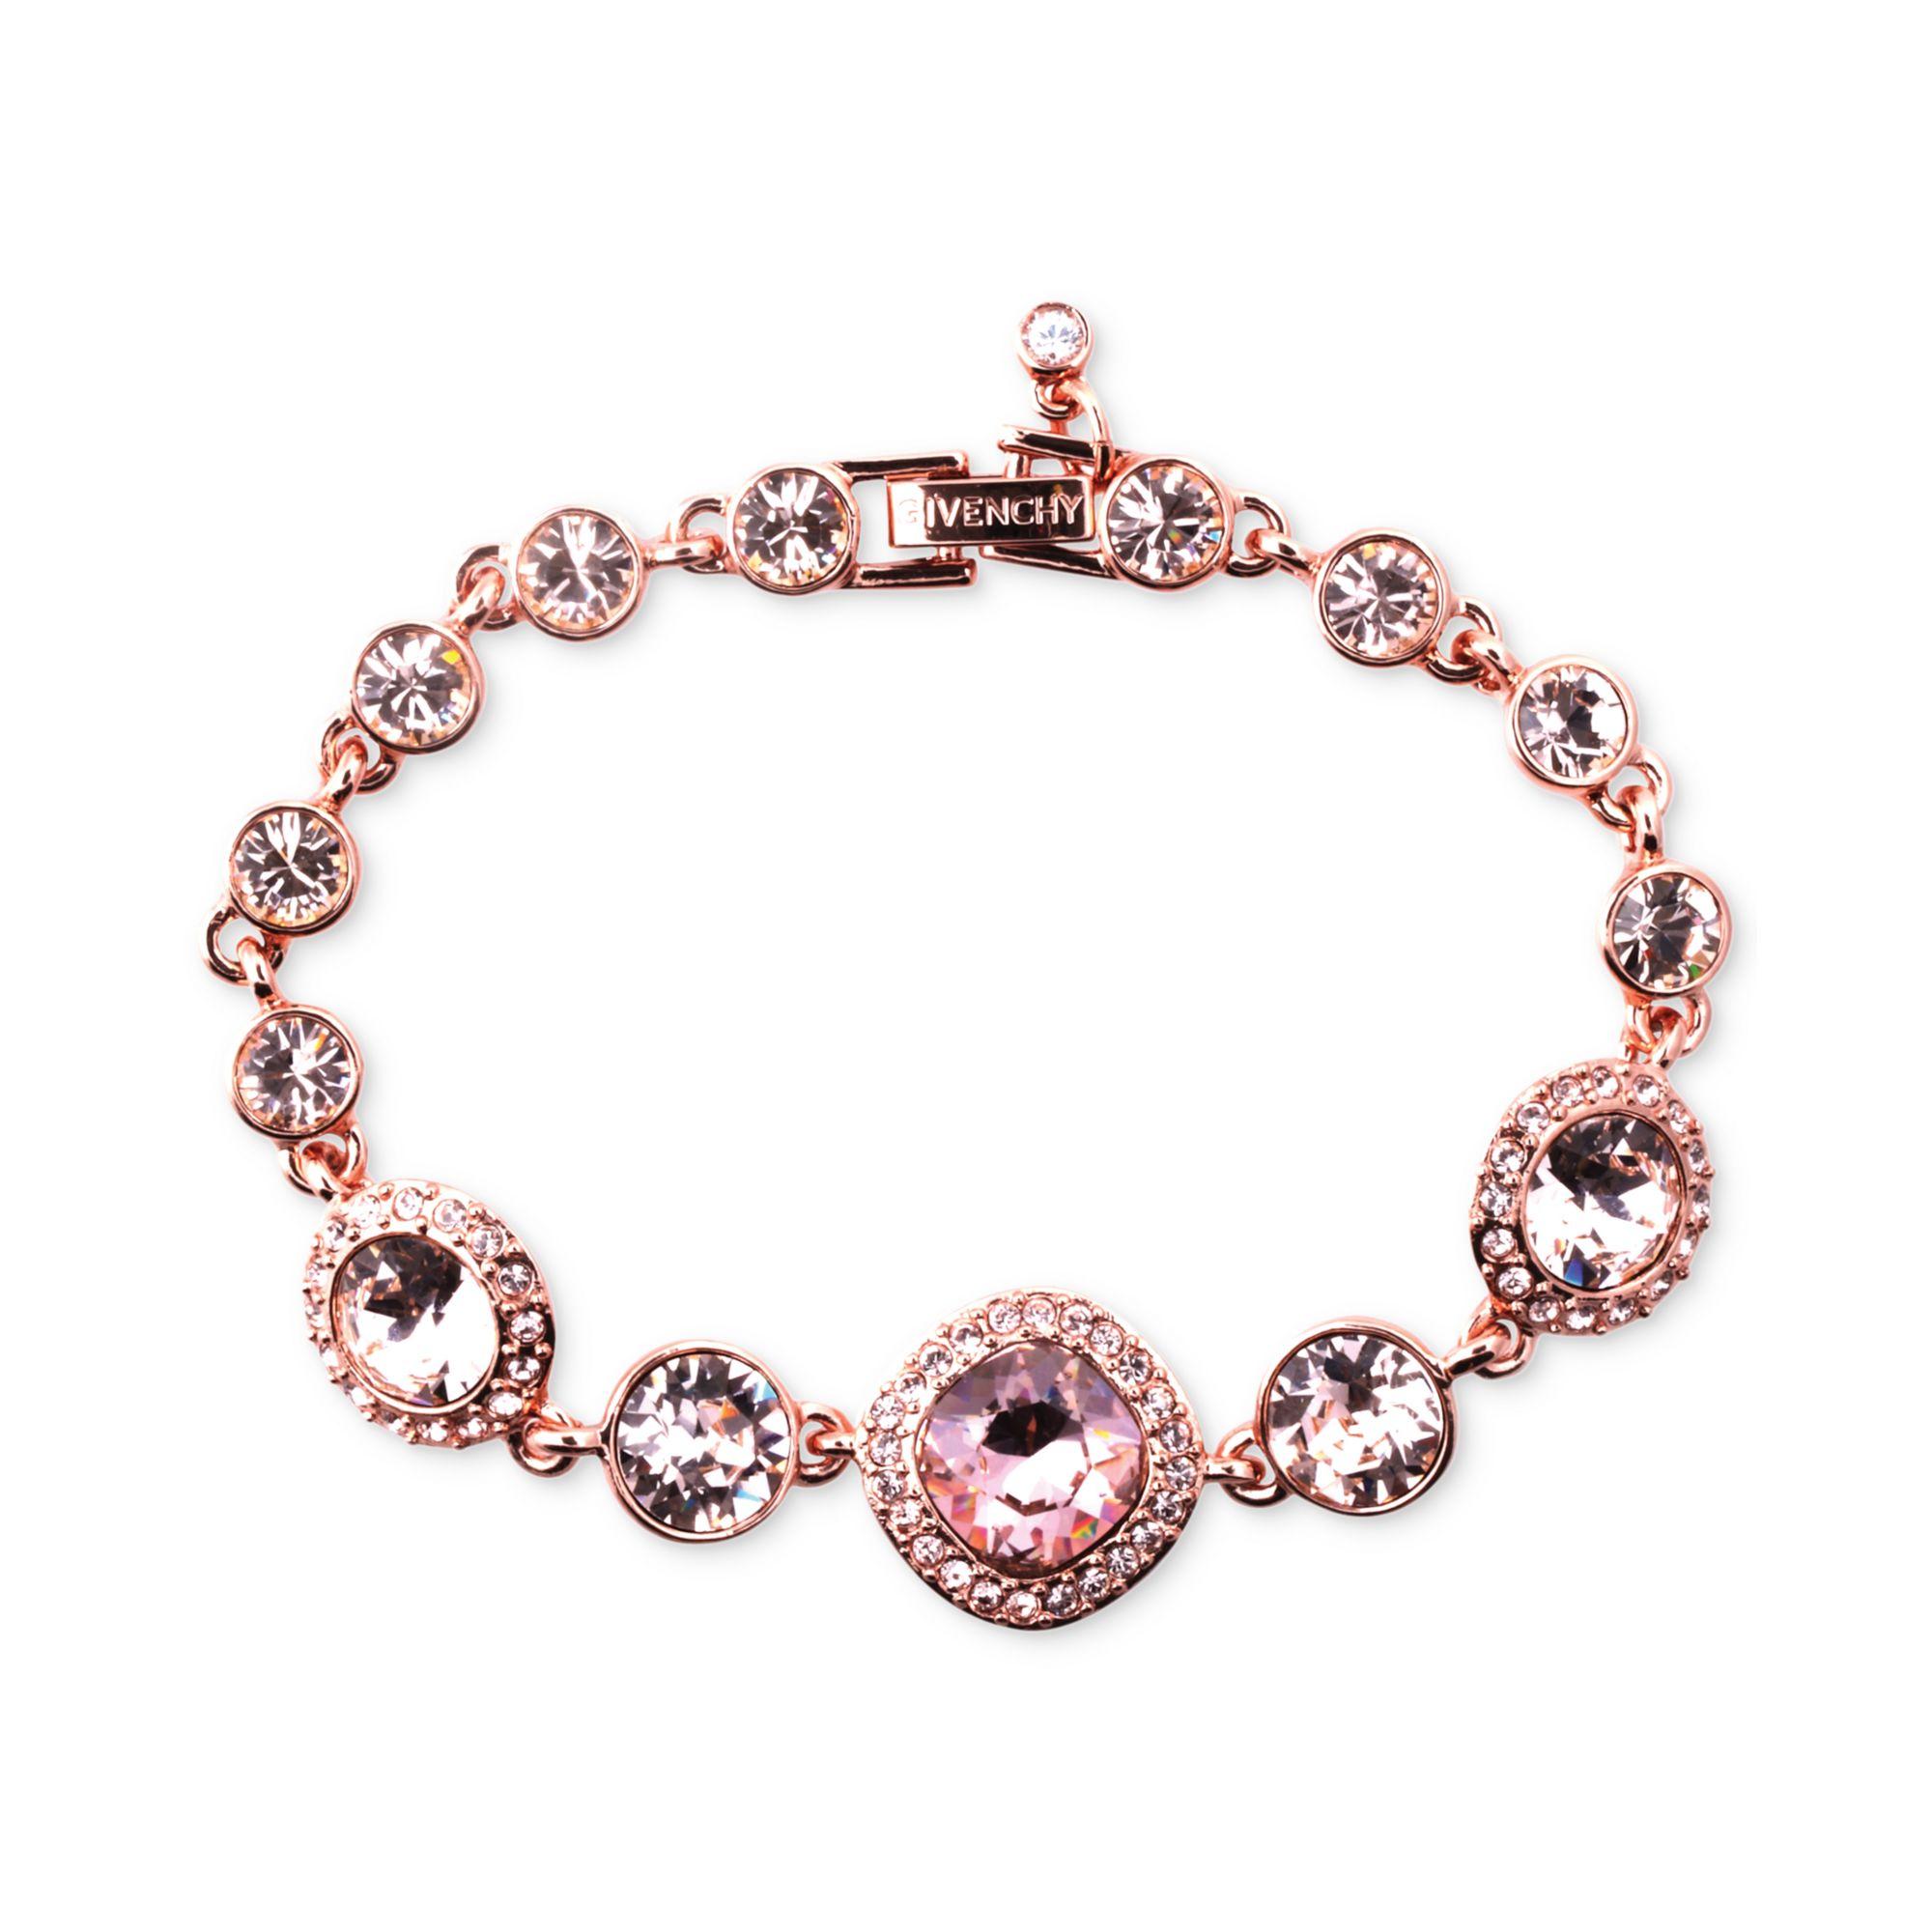 givenchy rose gold tone swarovski vintage stone bracelet